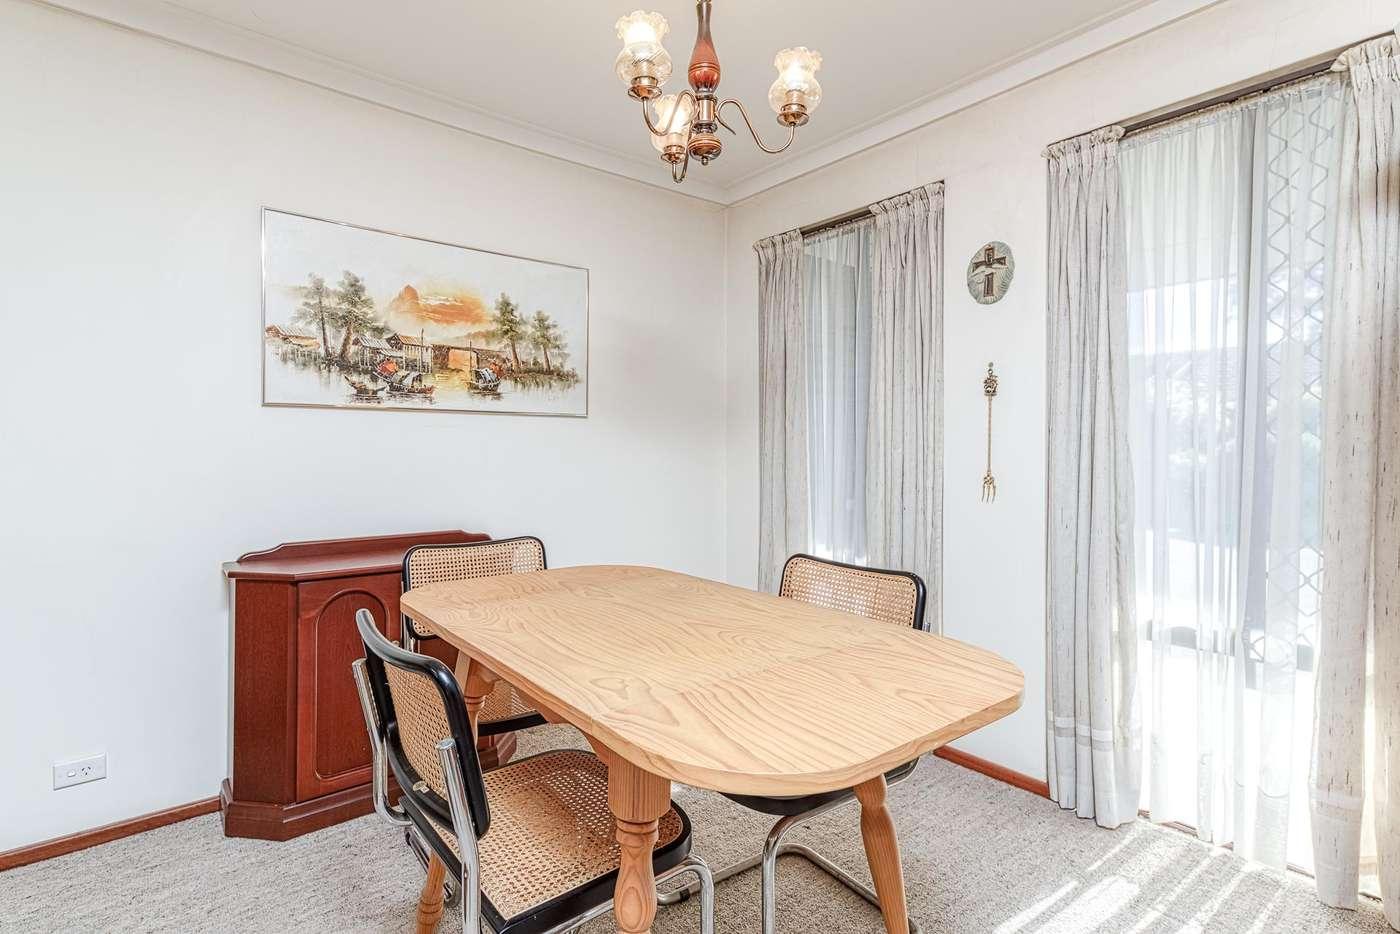 Sixth view of Homely villa listing, 5/13 Eudanda Place, Cannington WA 6107